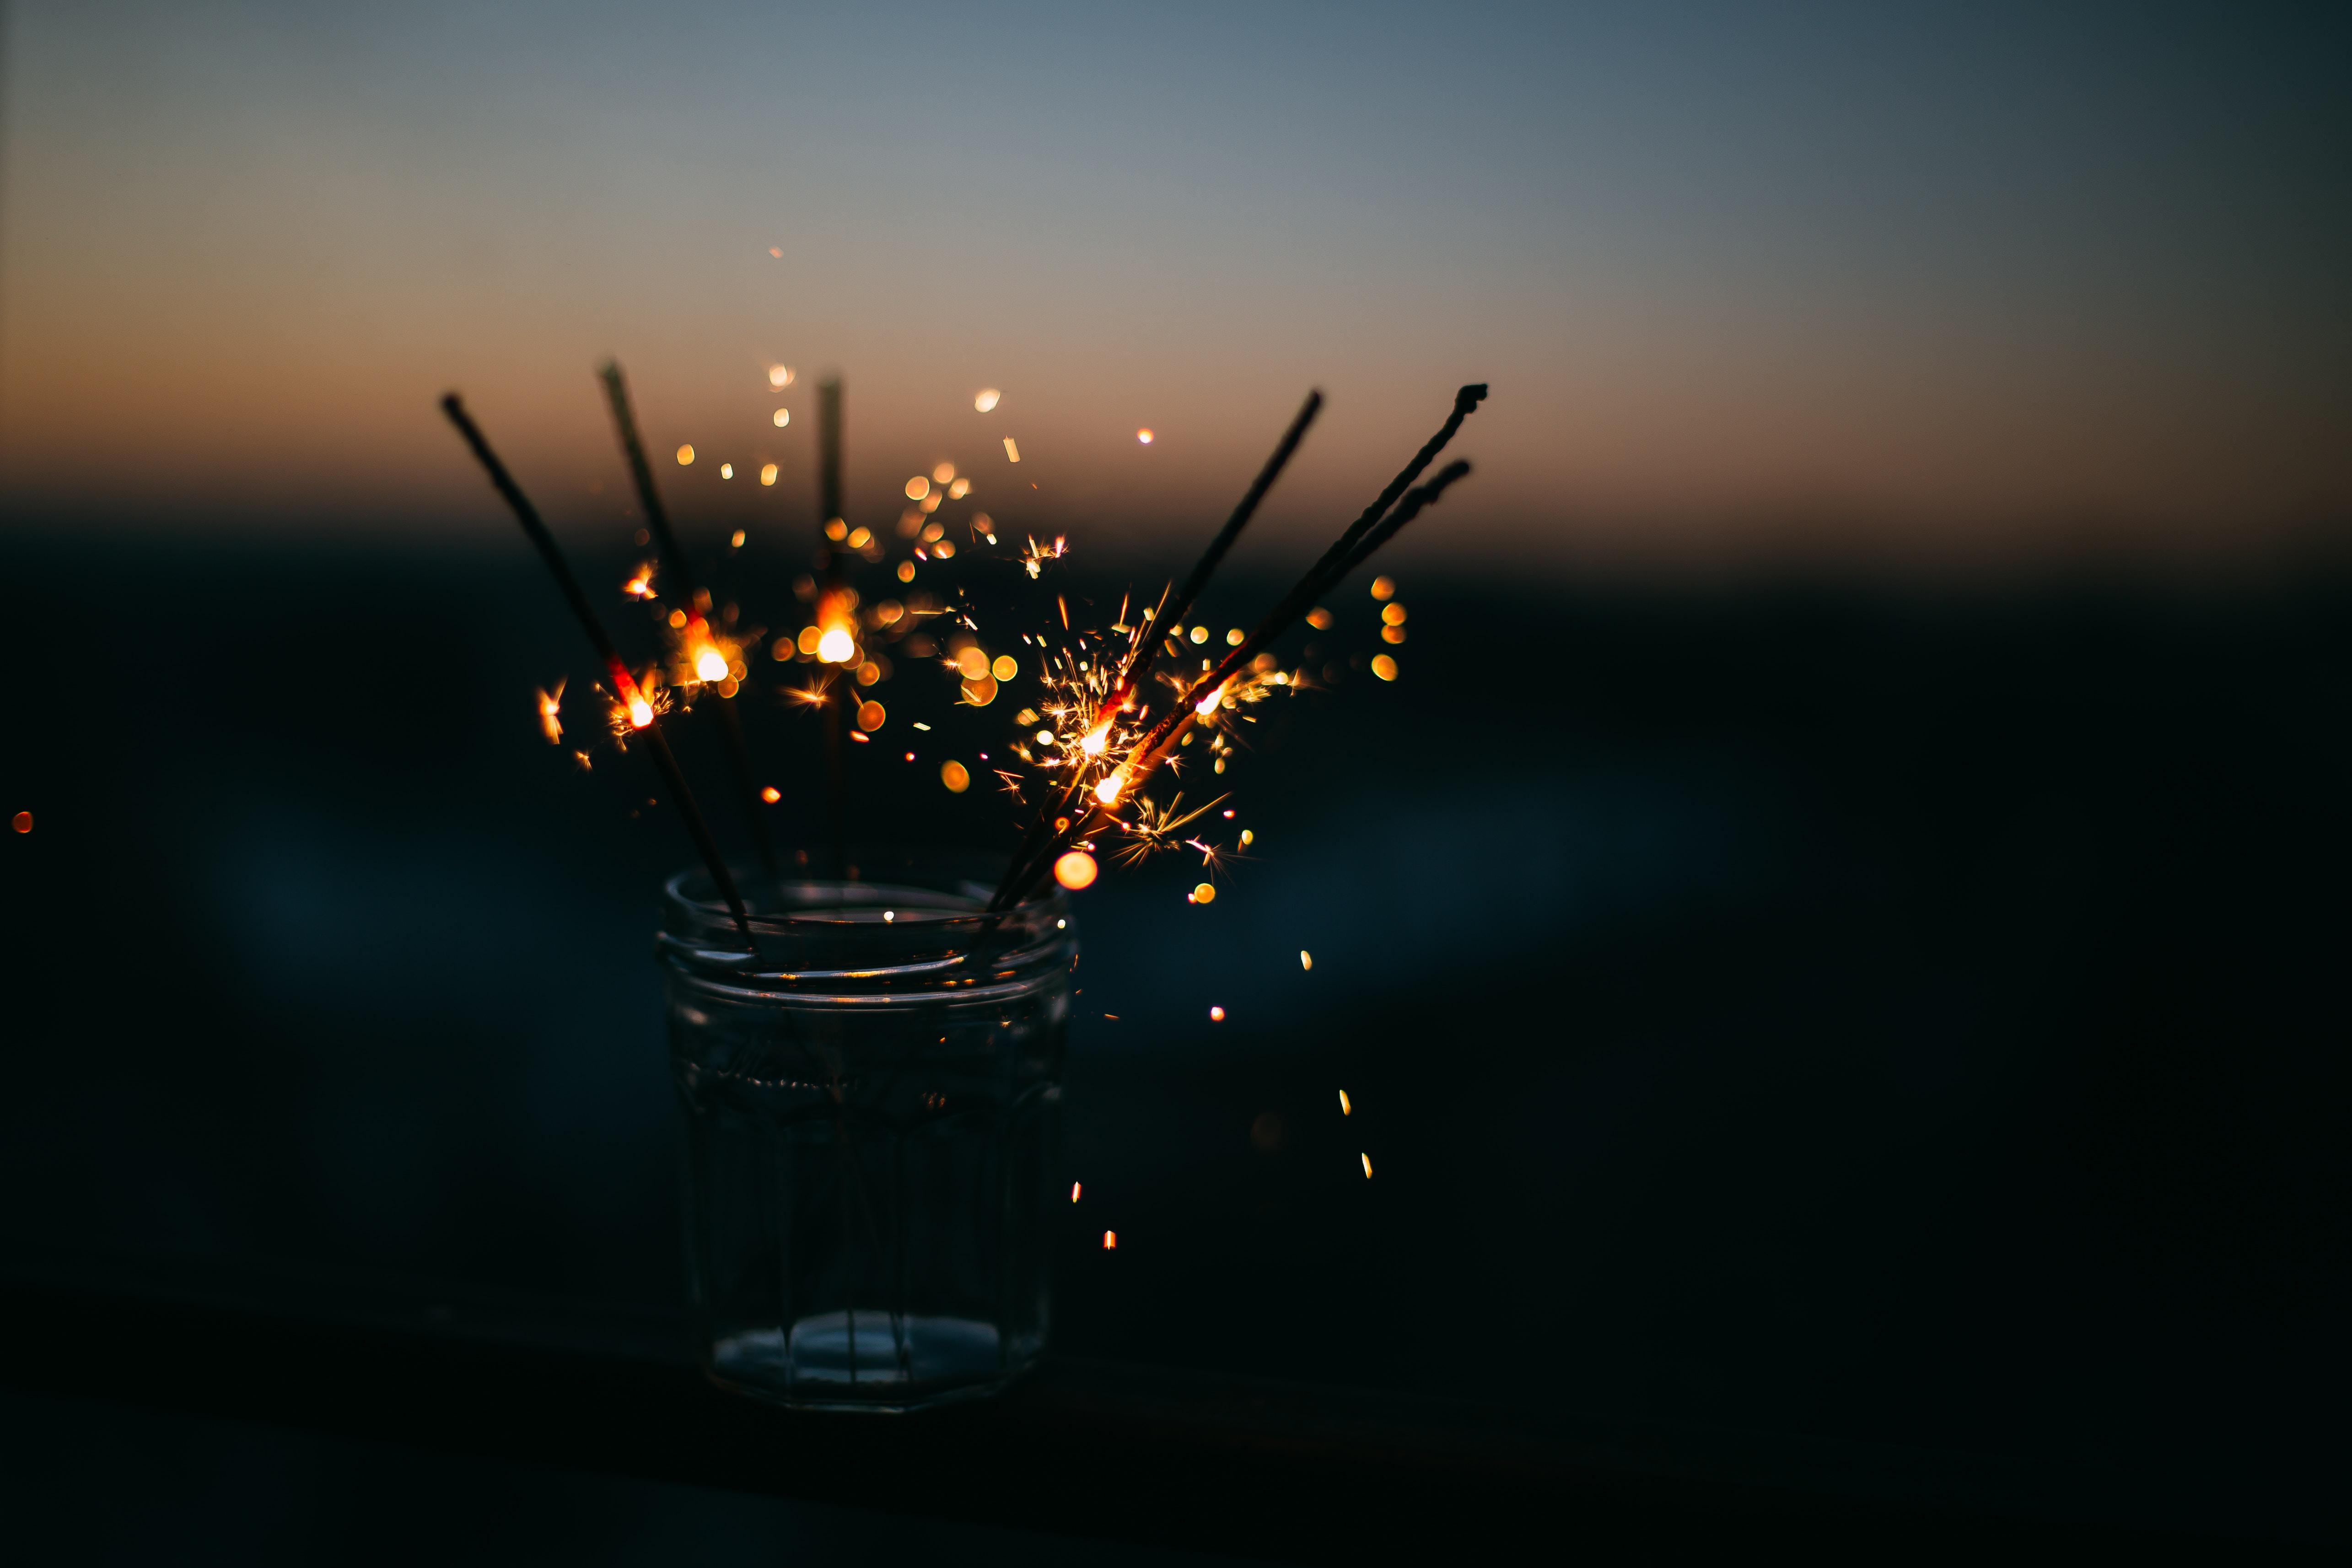 sparkler on jar